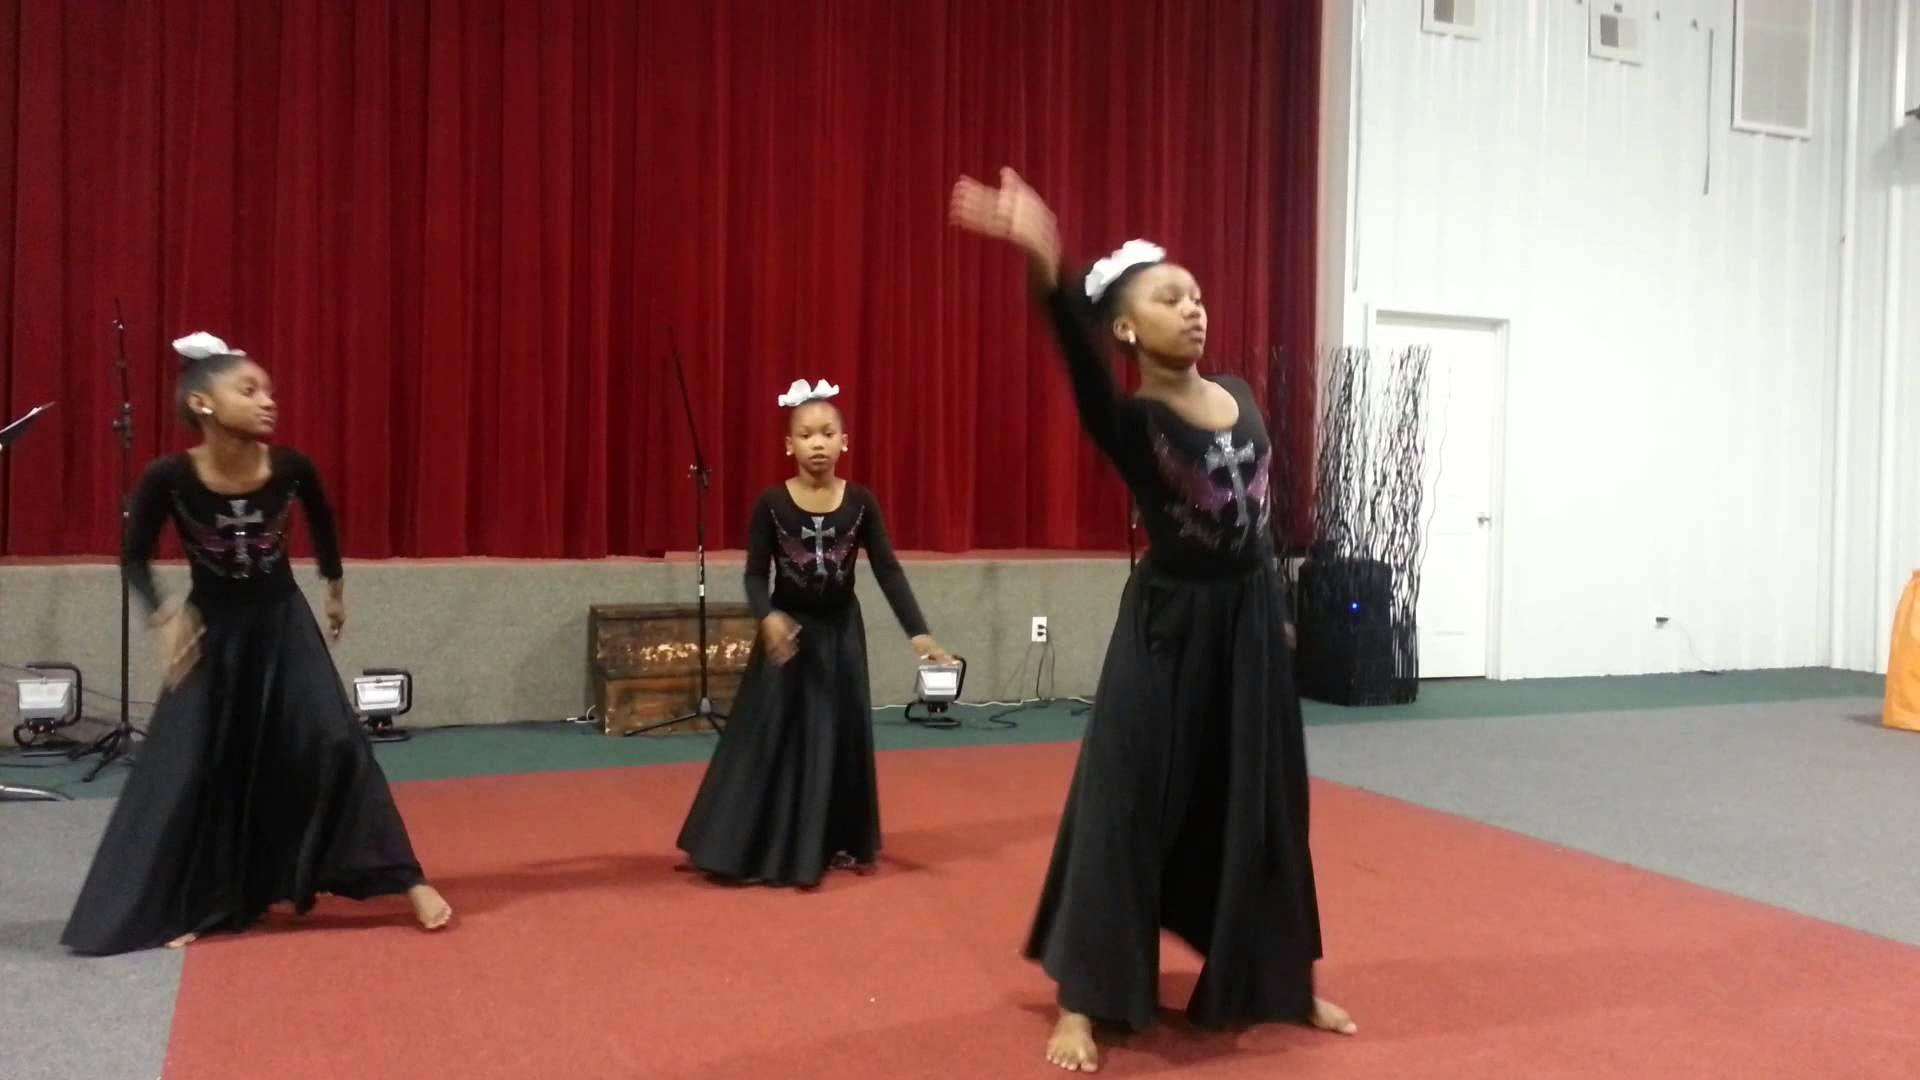 It S Working By William Murphy Worship Dance Praise Dance Dance Life